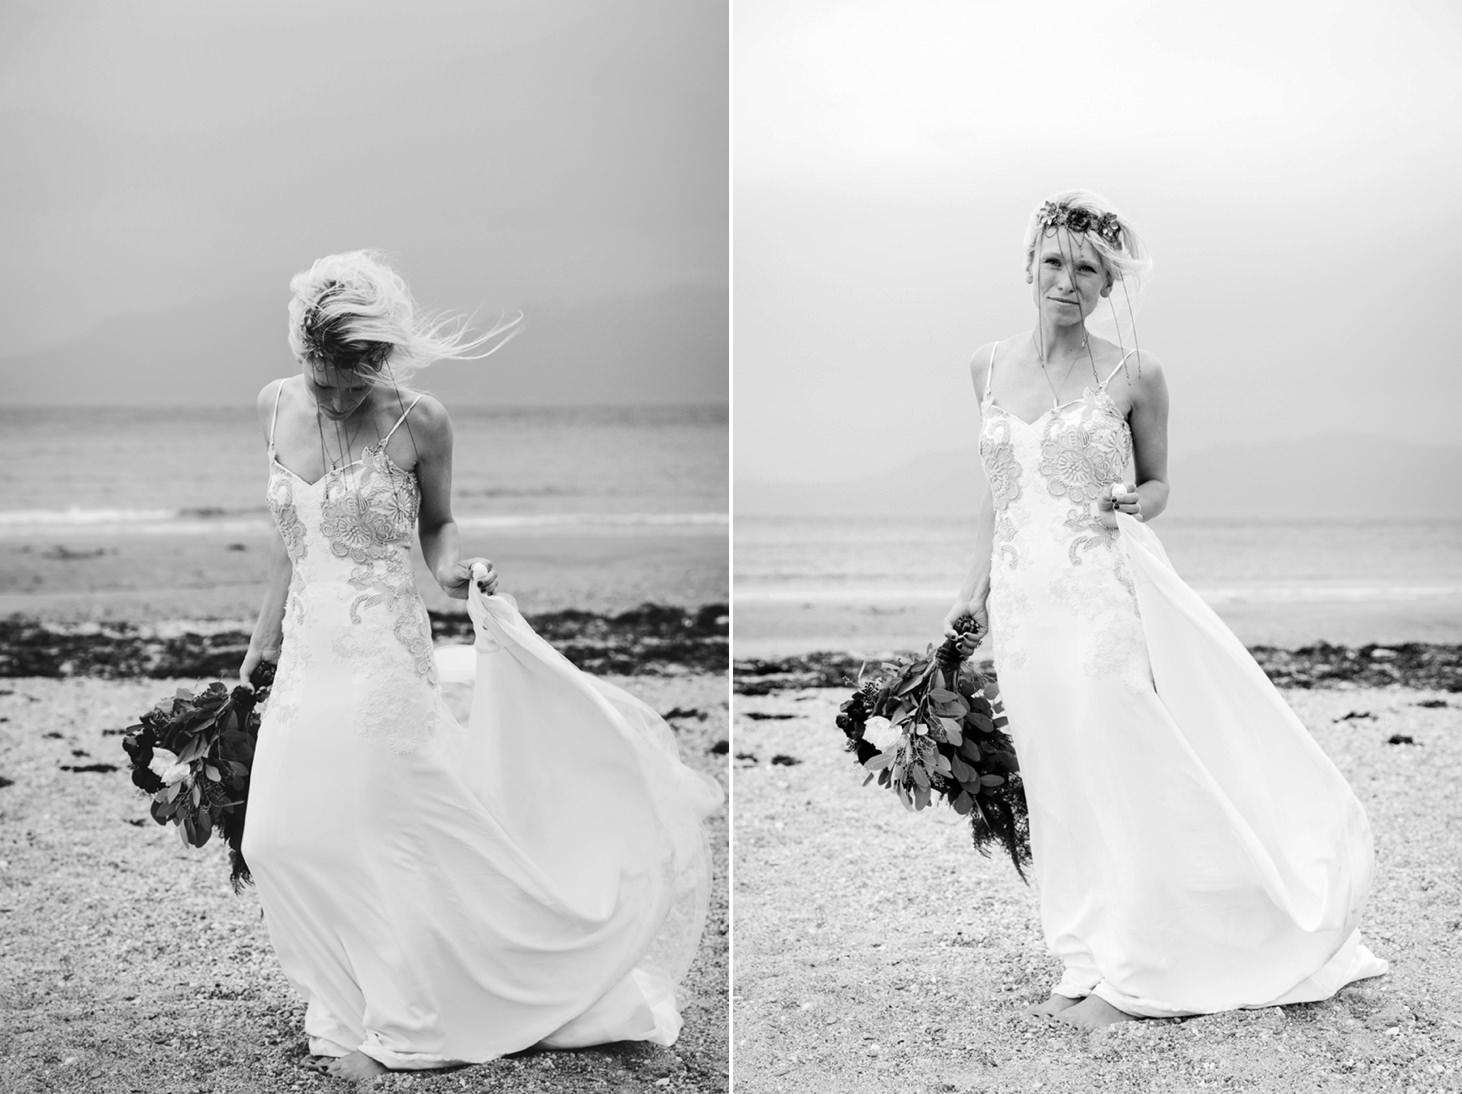 sle of bute wedding photography bride portrait